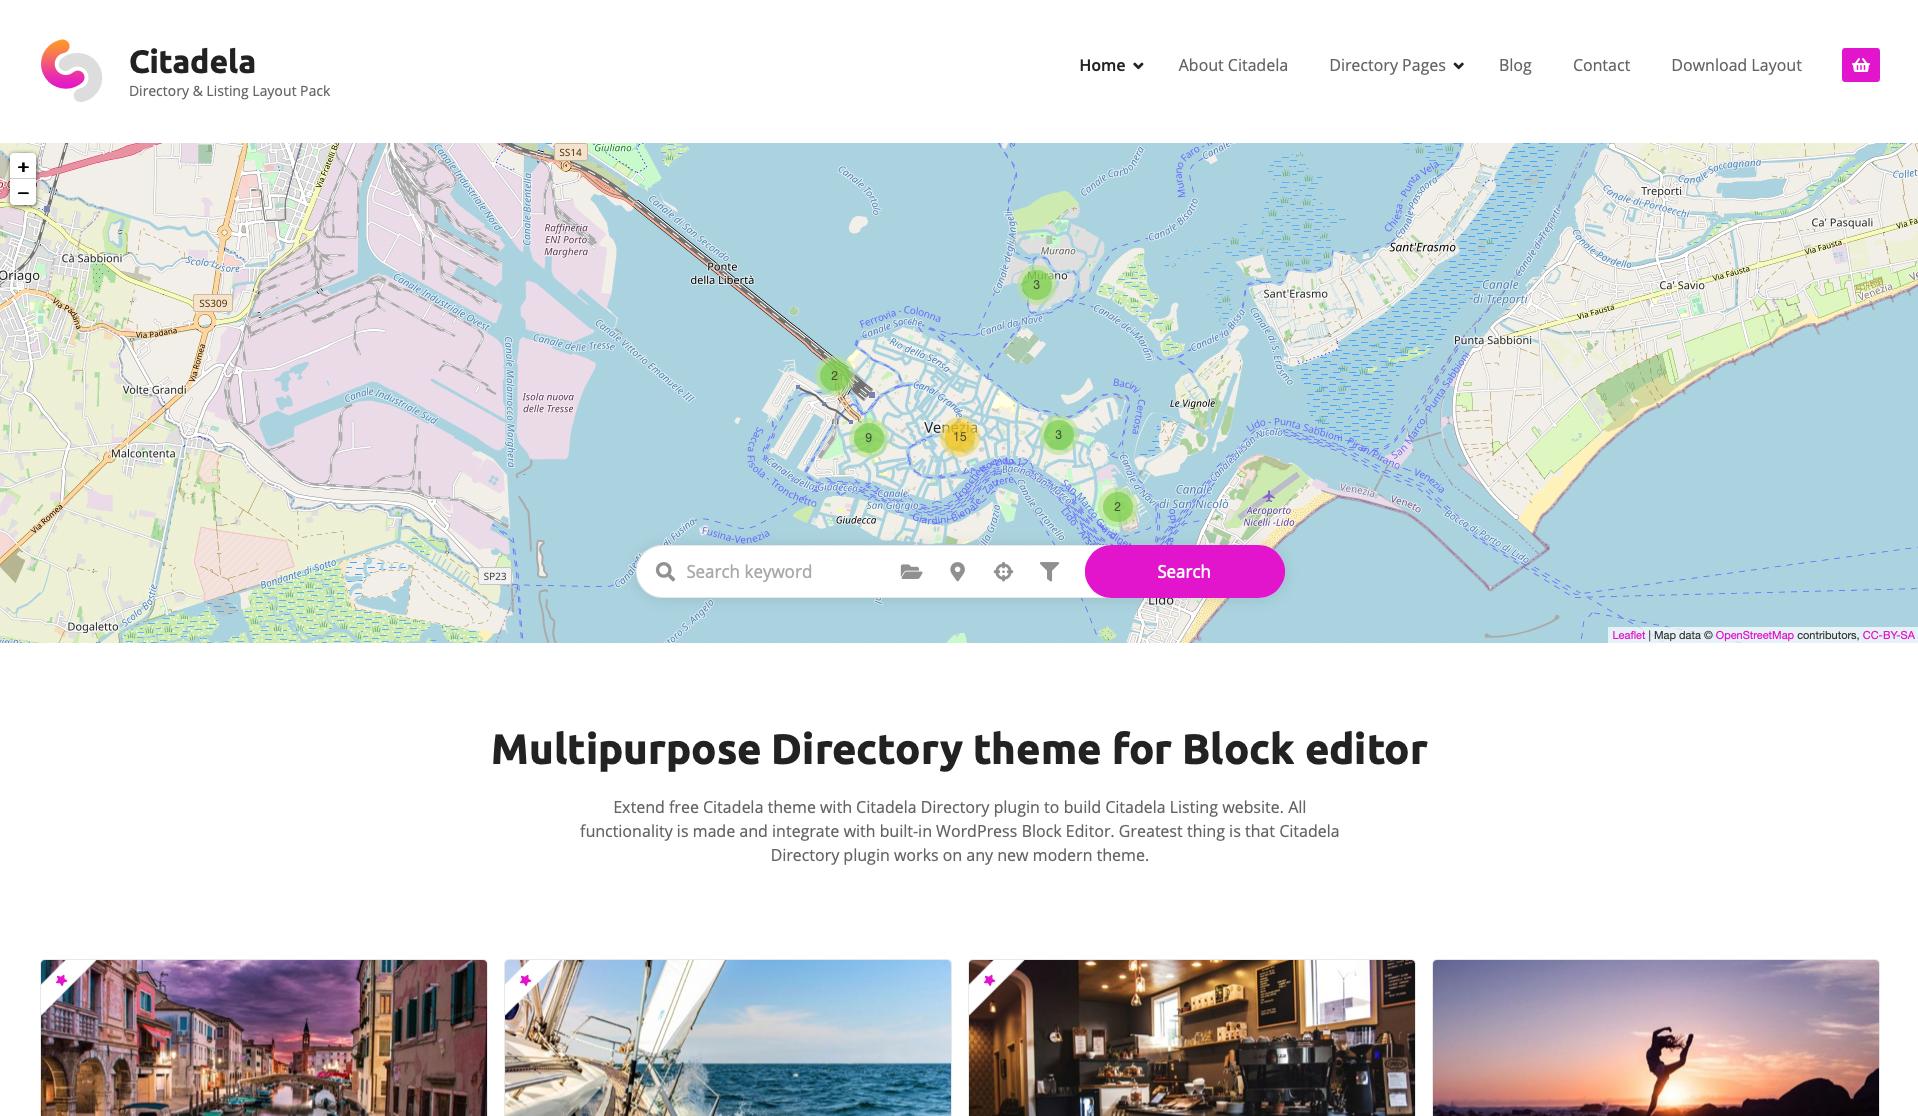 WordPress Directory theme layout called Citadela Listing